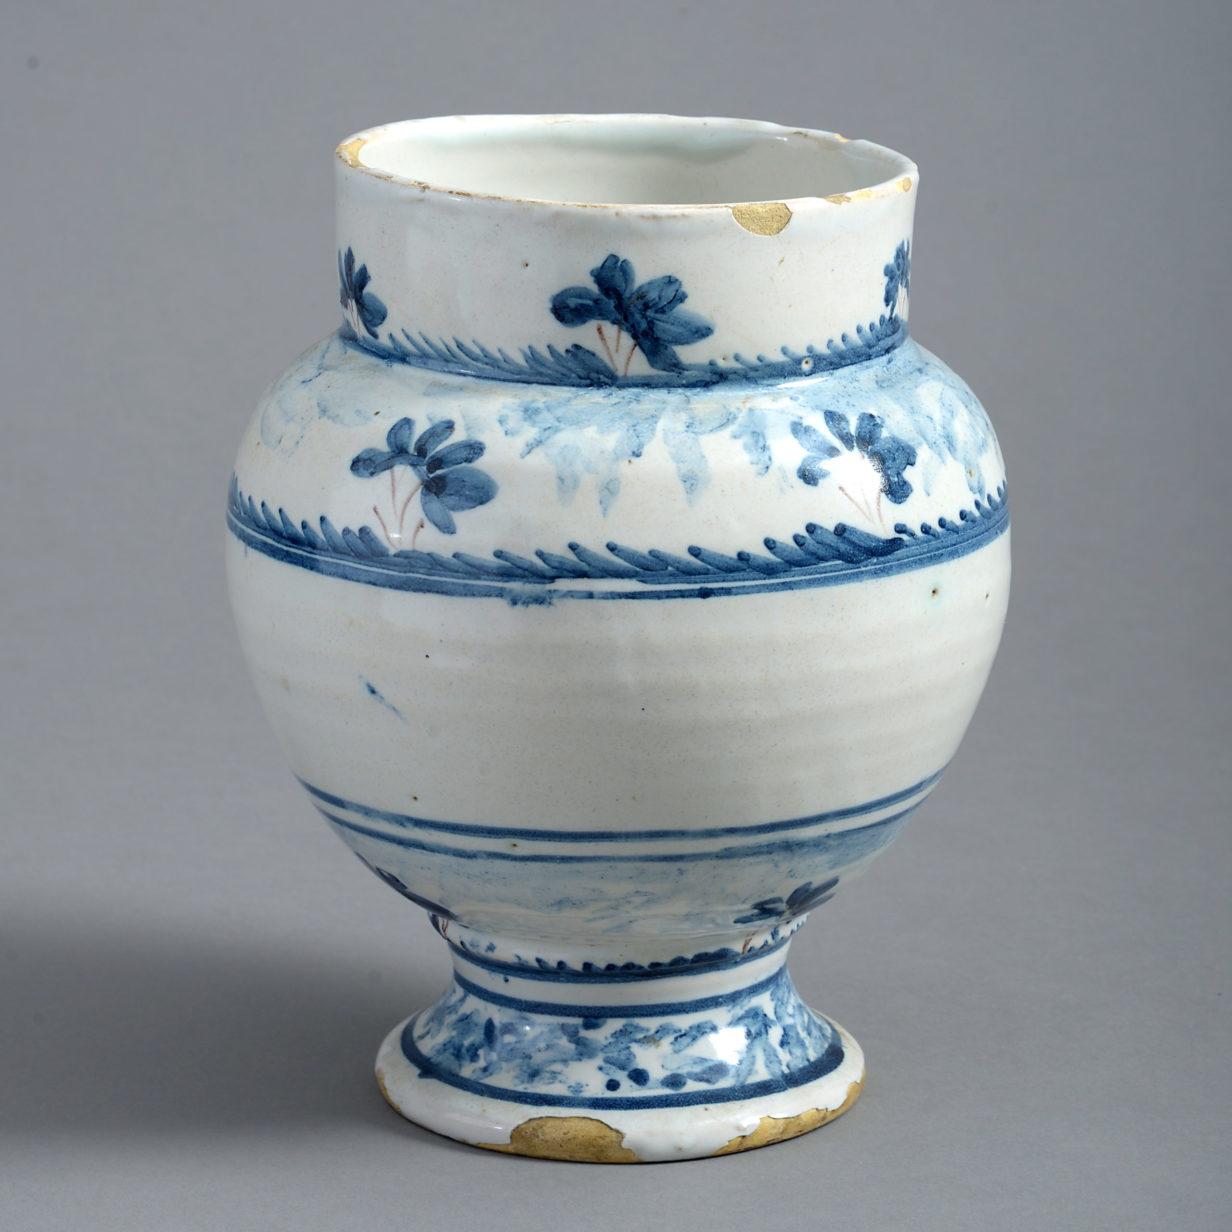 Blue and White Delft Vase